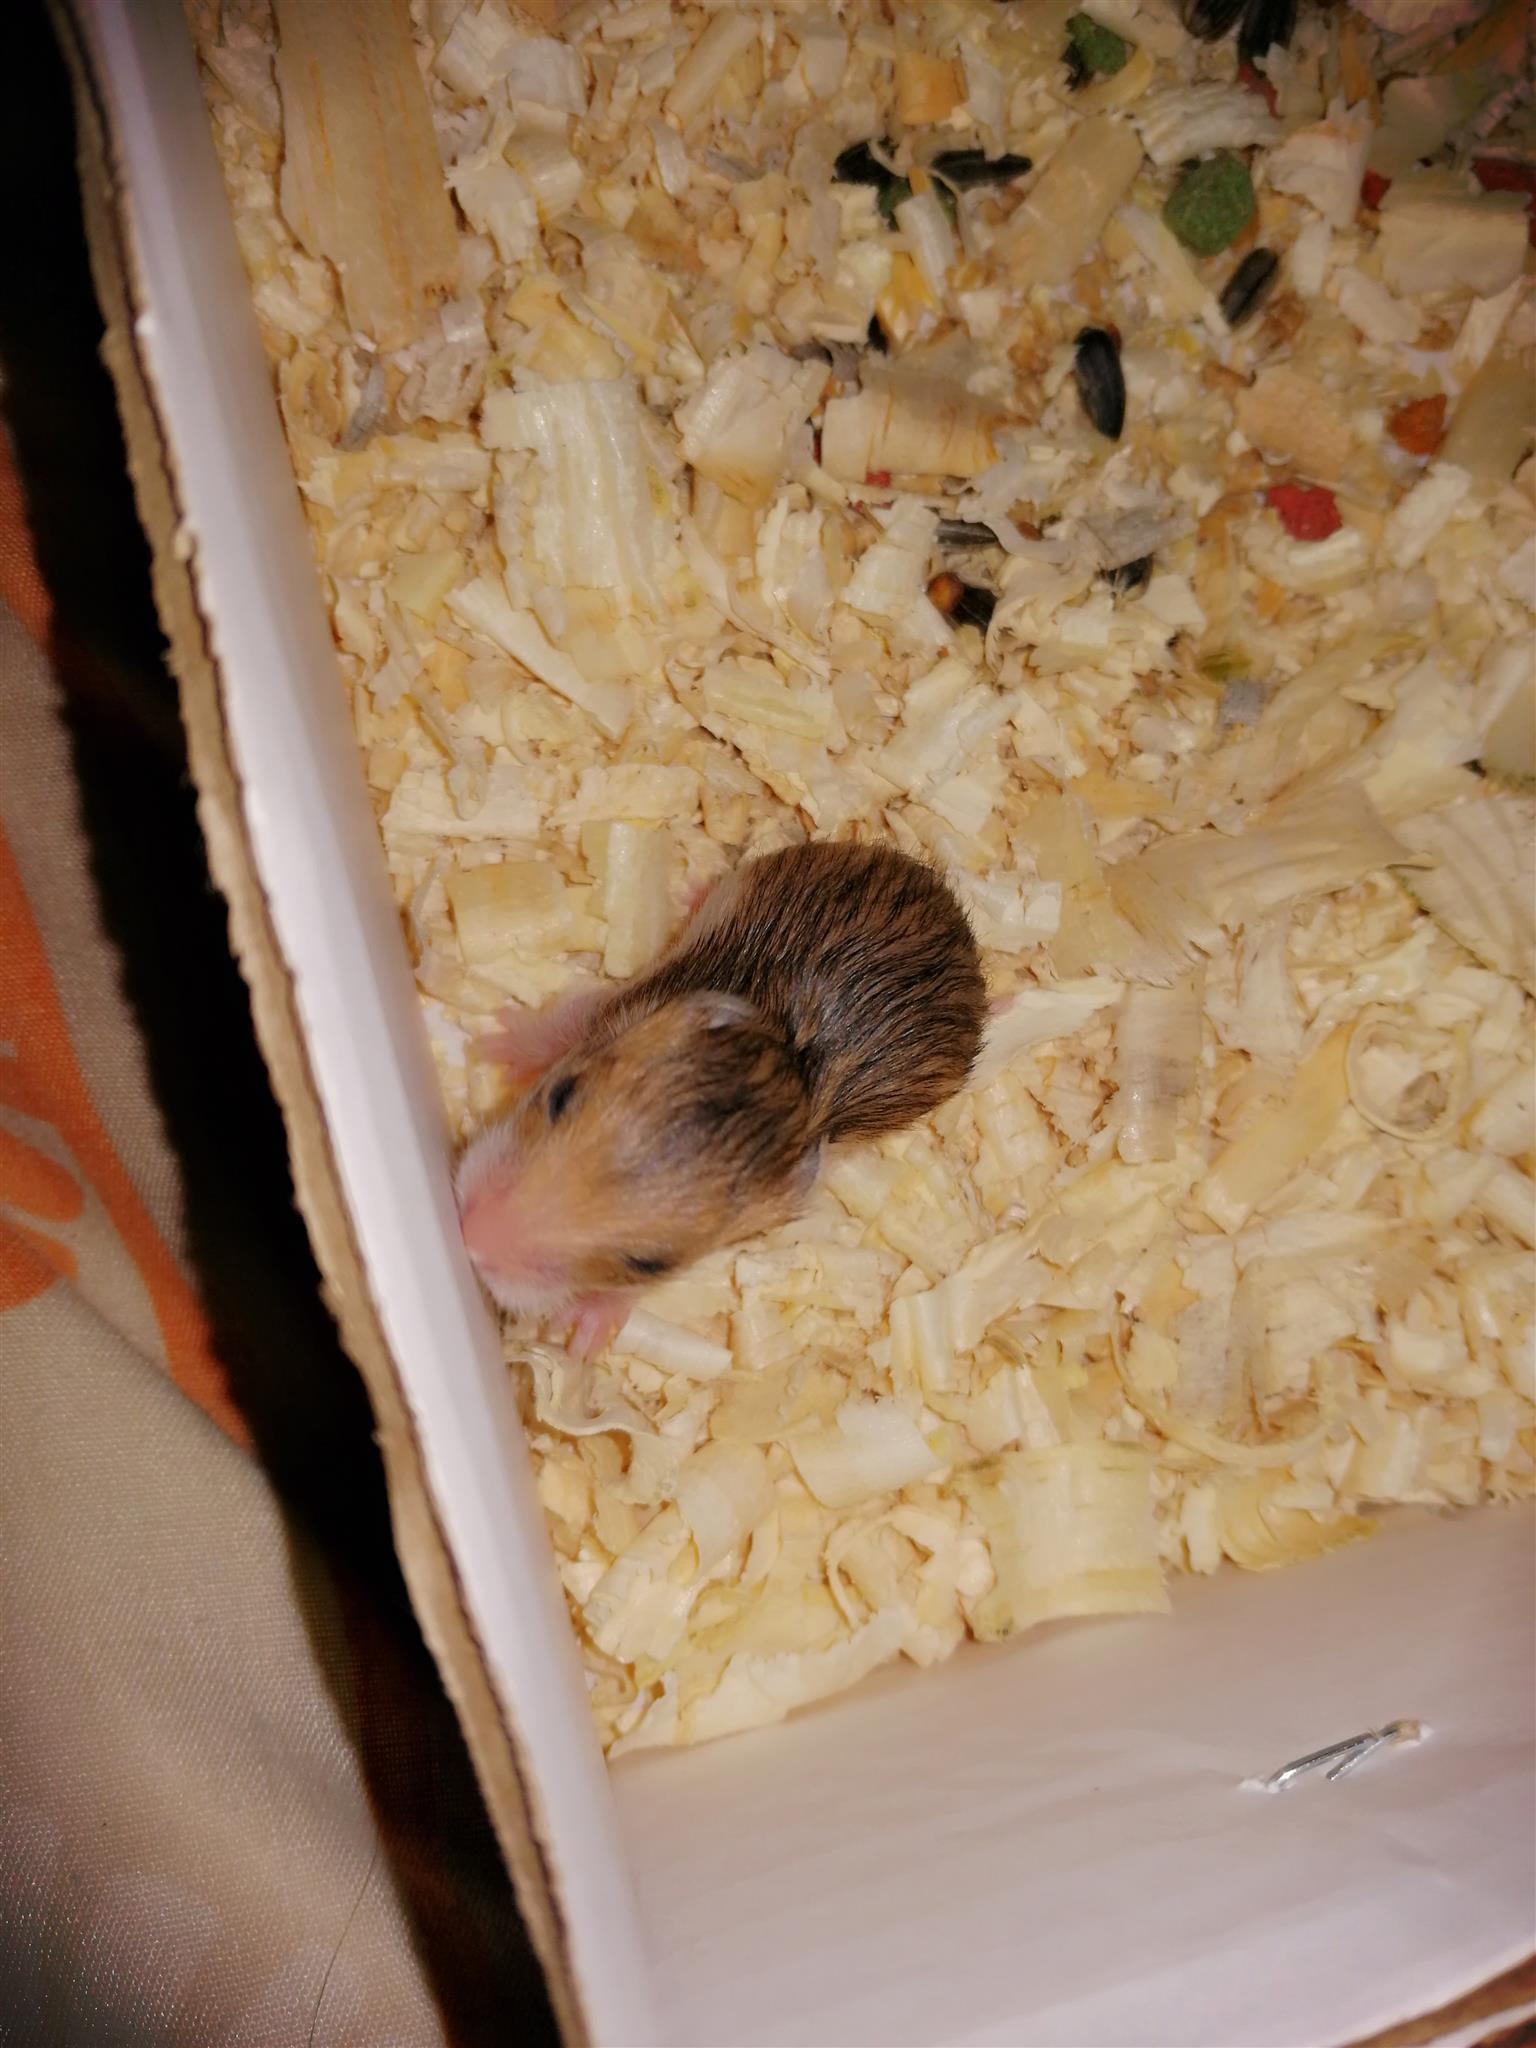 Teddybear Hamsters